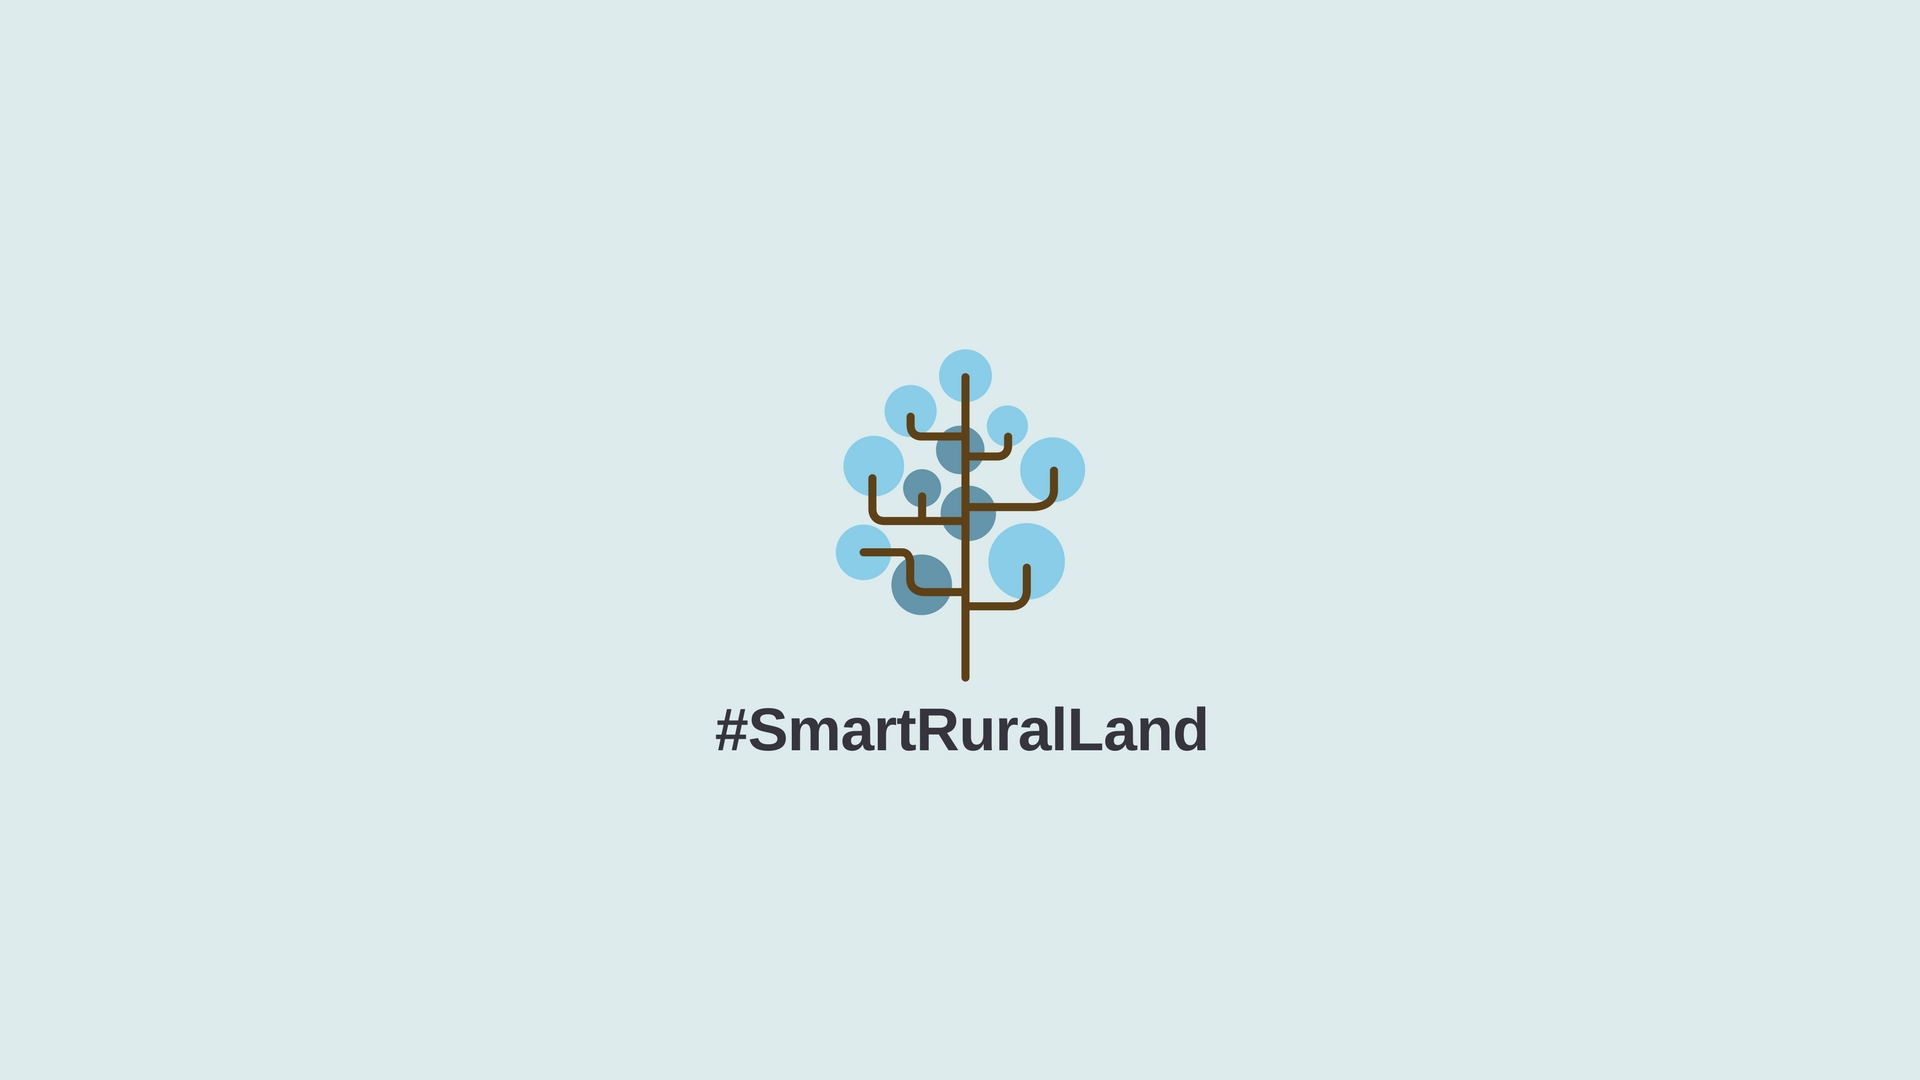 SmartRuralLand_Discipulas_Gea